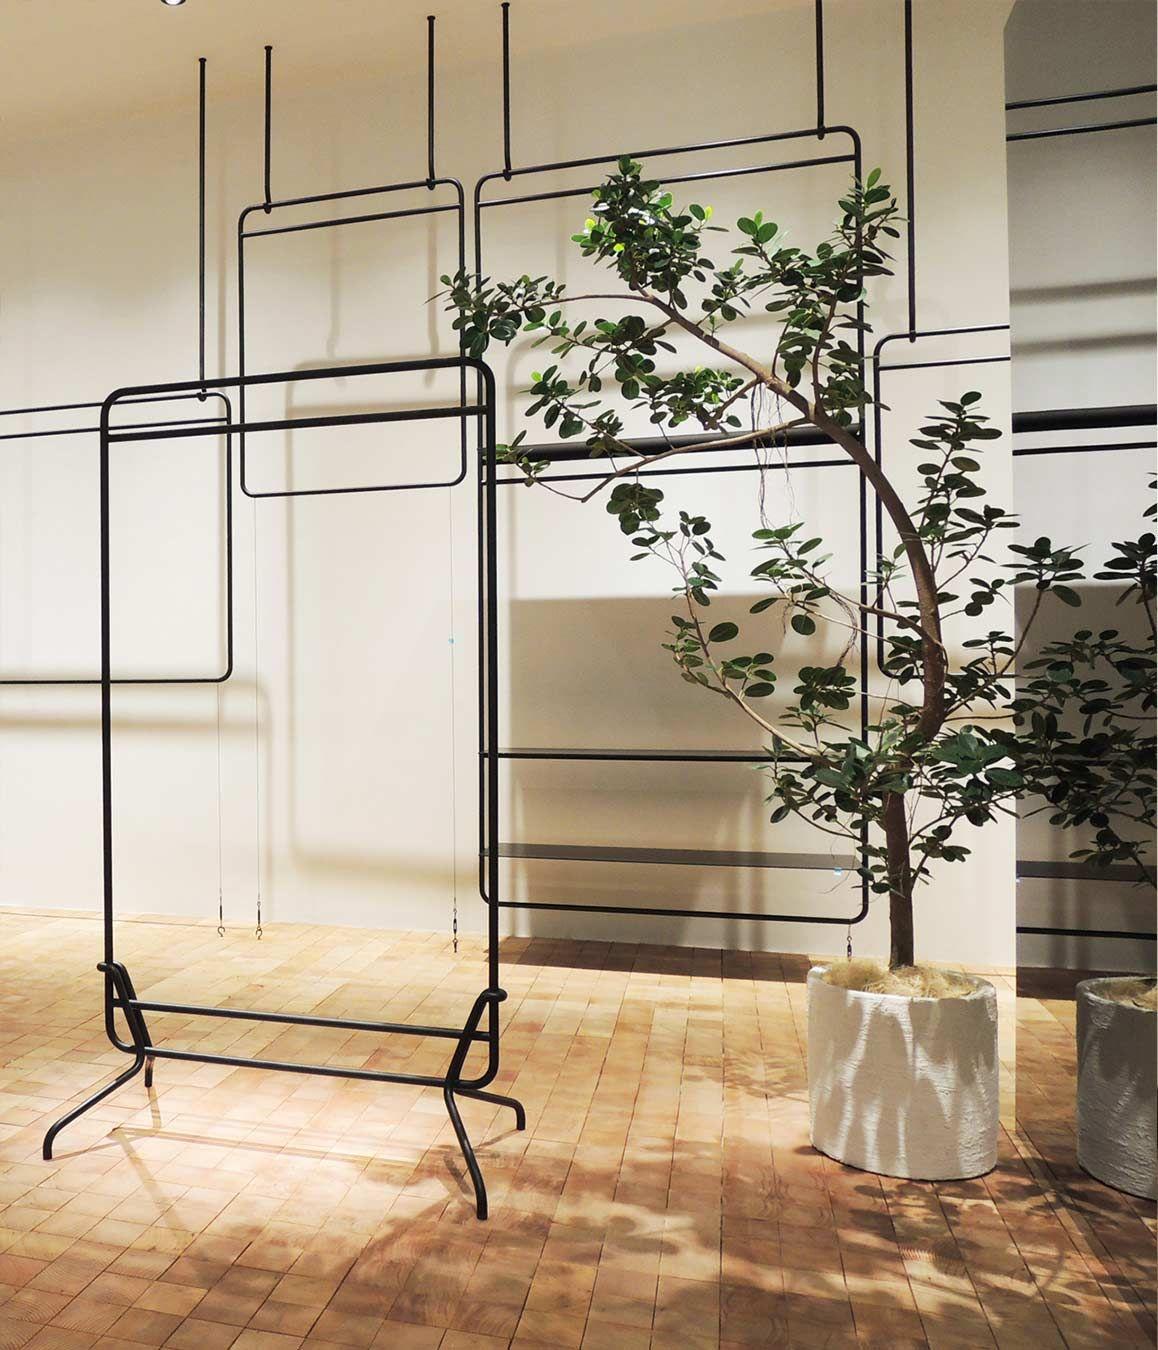 Interior Designer Furniture Installation Waiver ~ Architecture interior design furniture installation